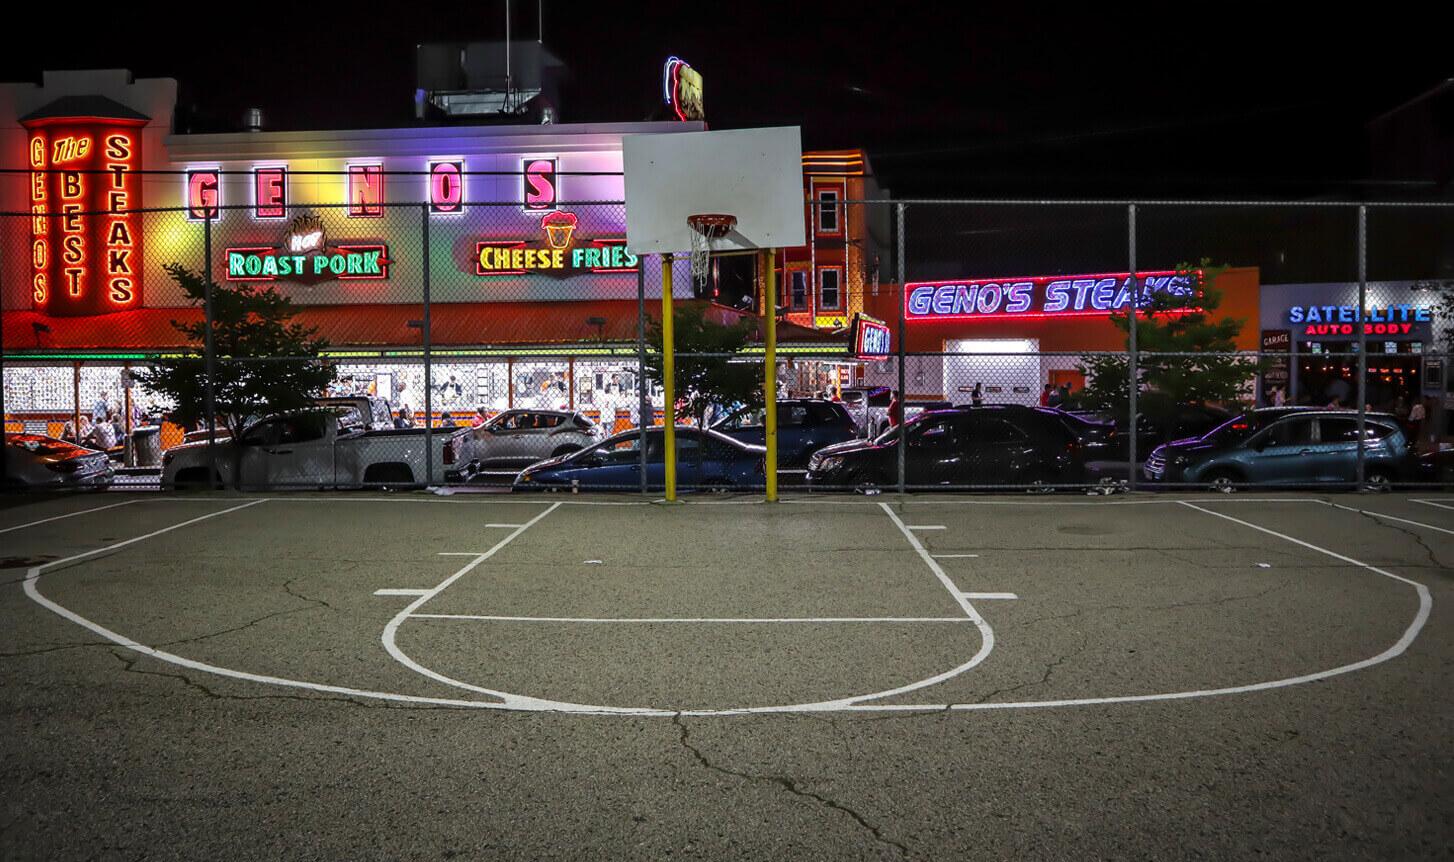 Top Philly Cheesesteak in Philadelphia - Geno's Steaks